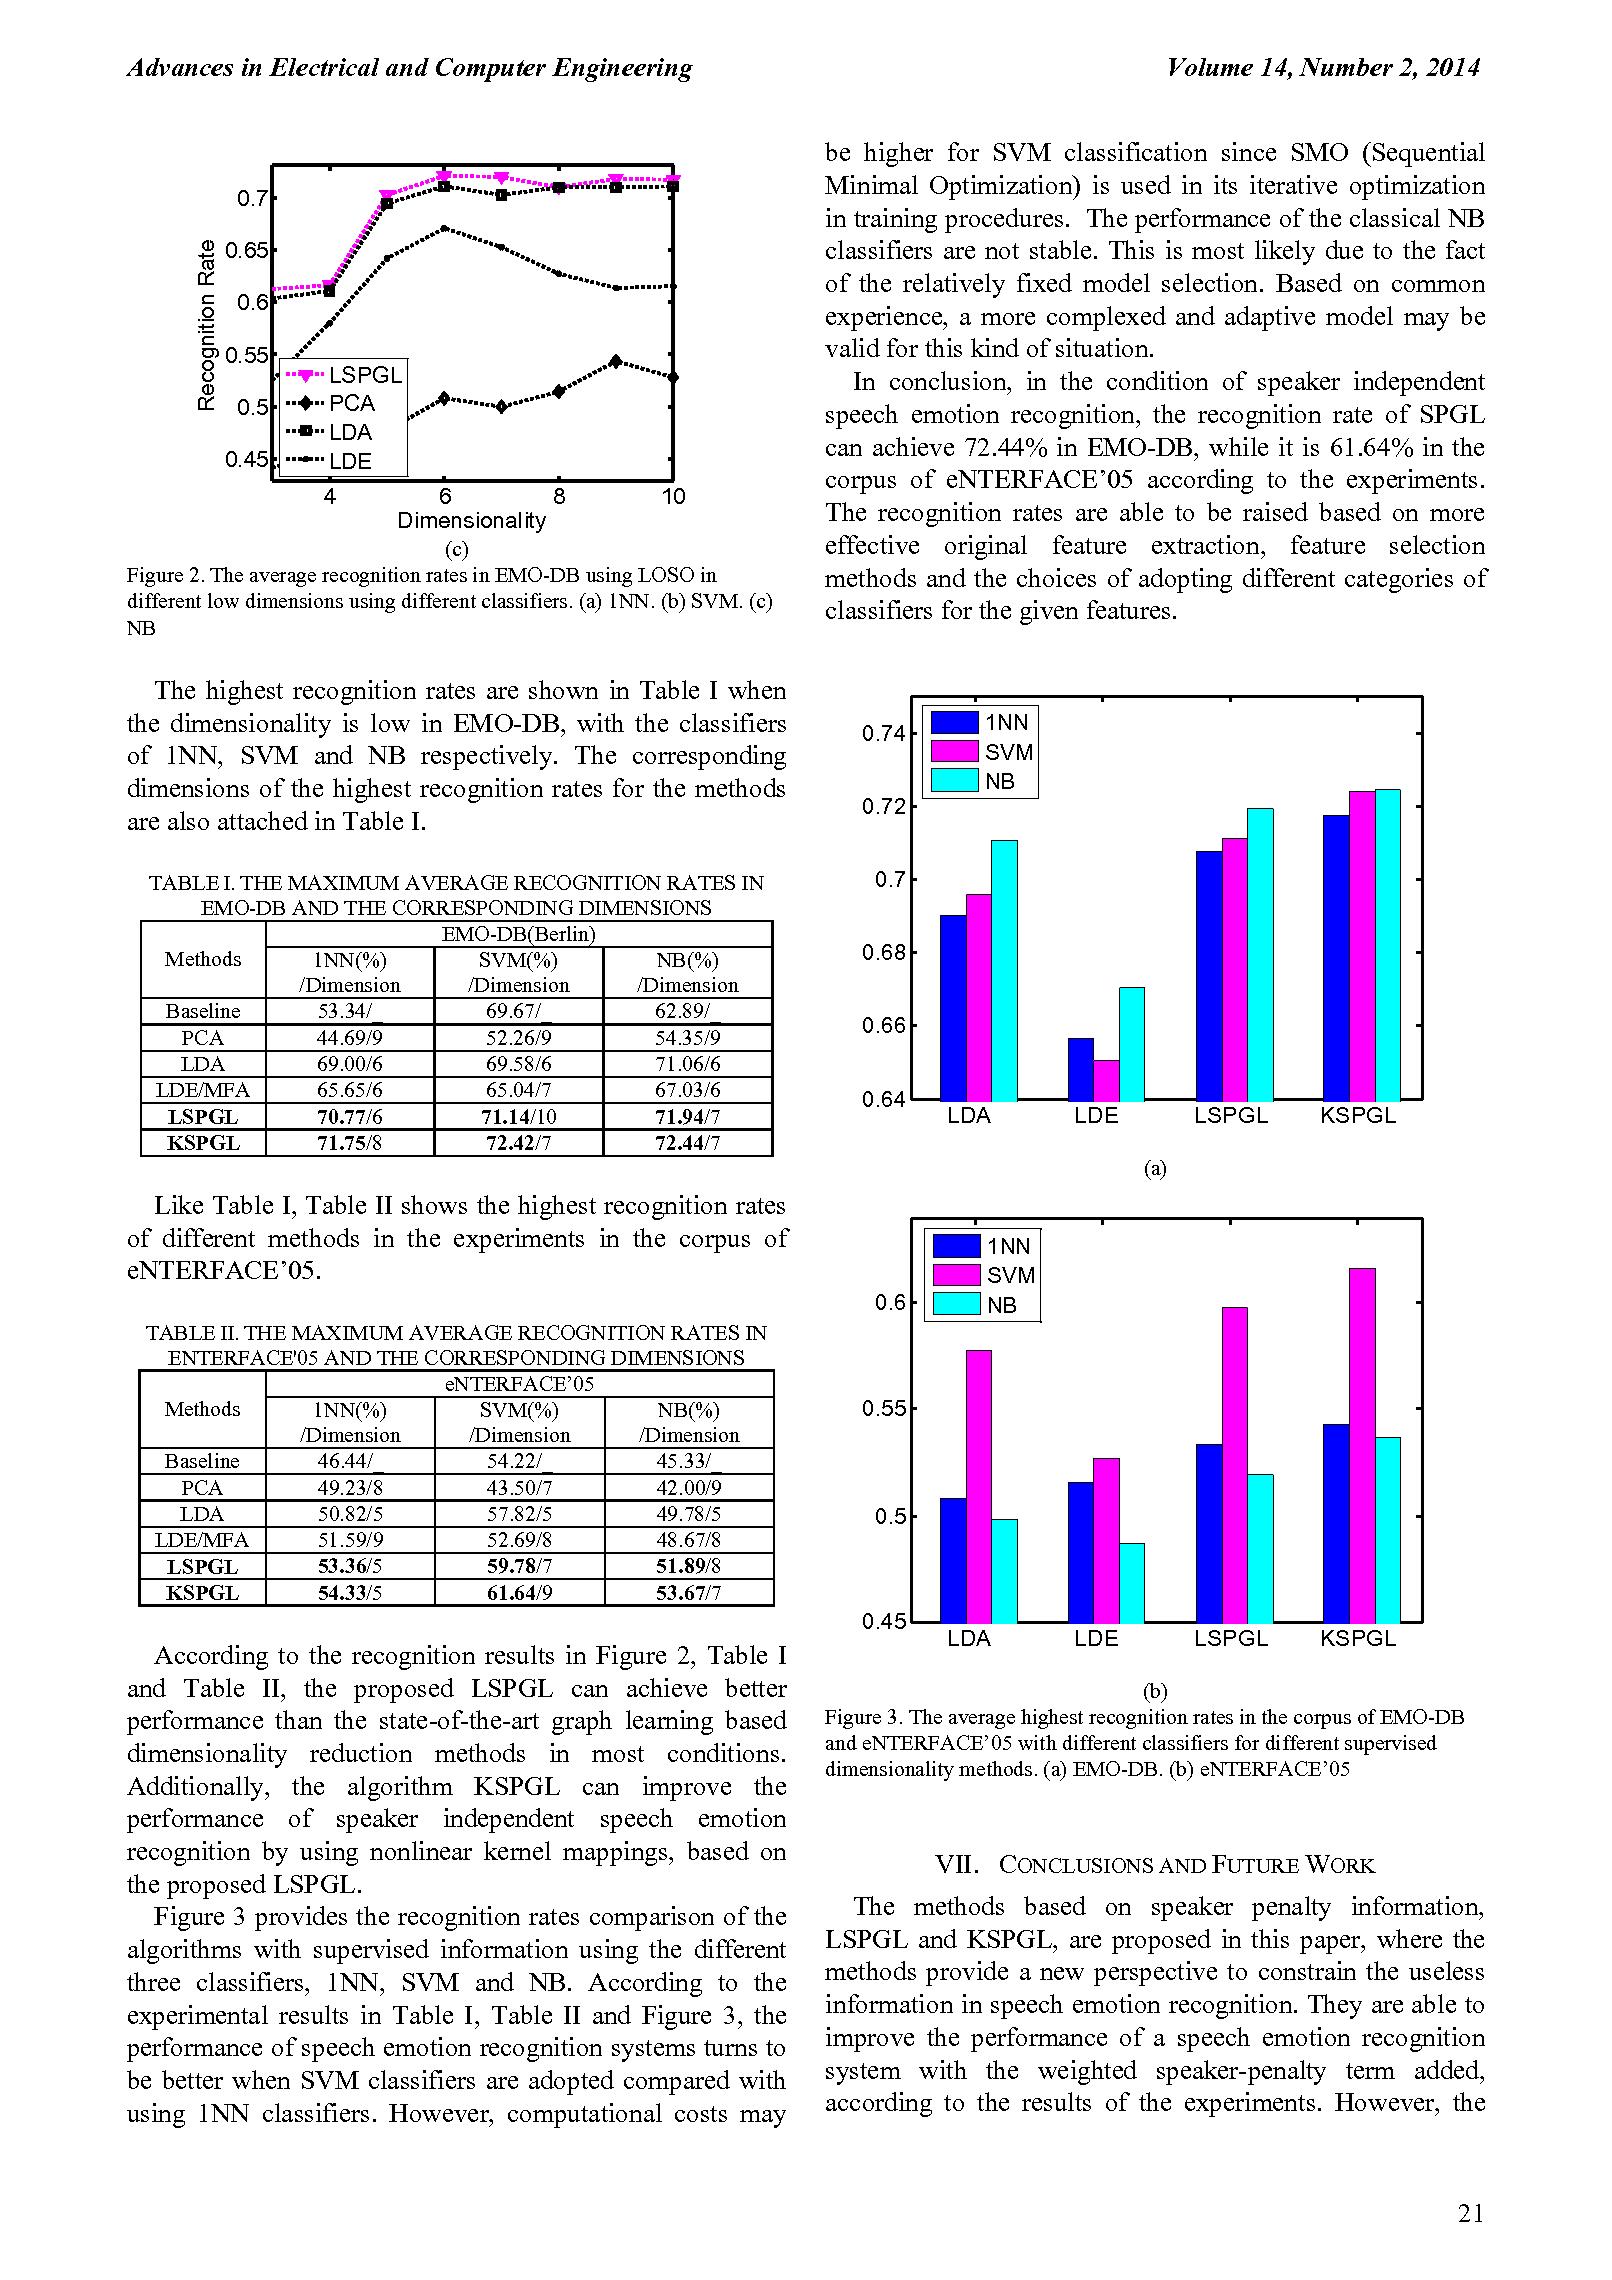 Graph Learning Based Speaker Independent Speech Emotion